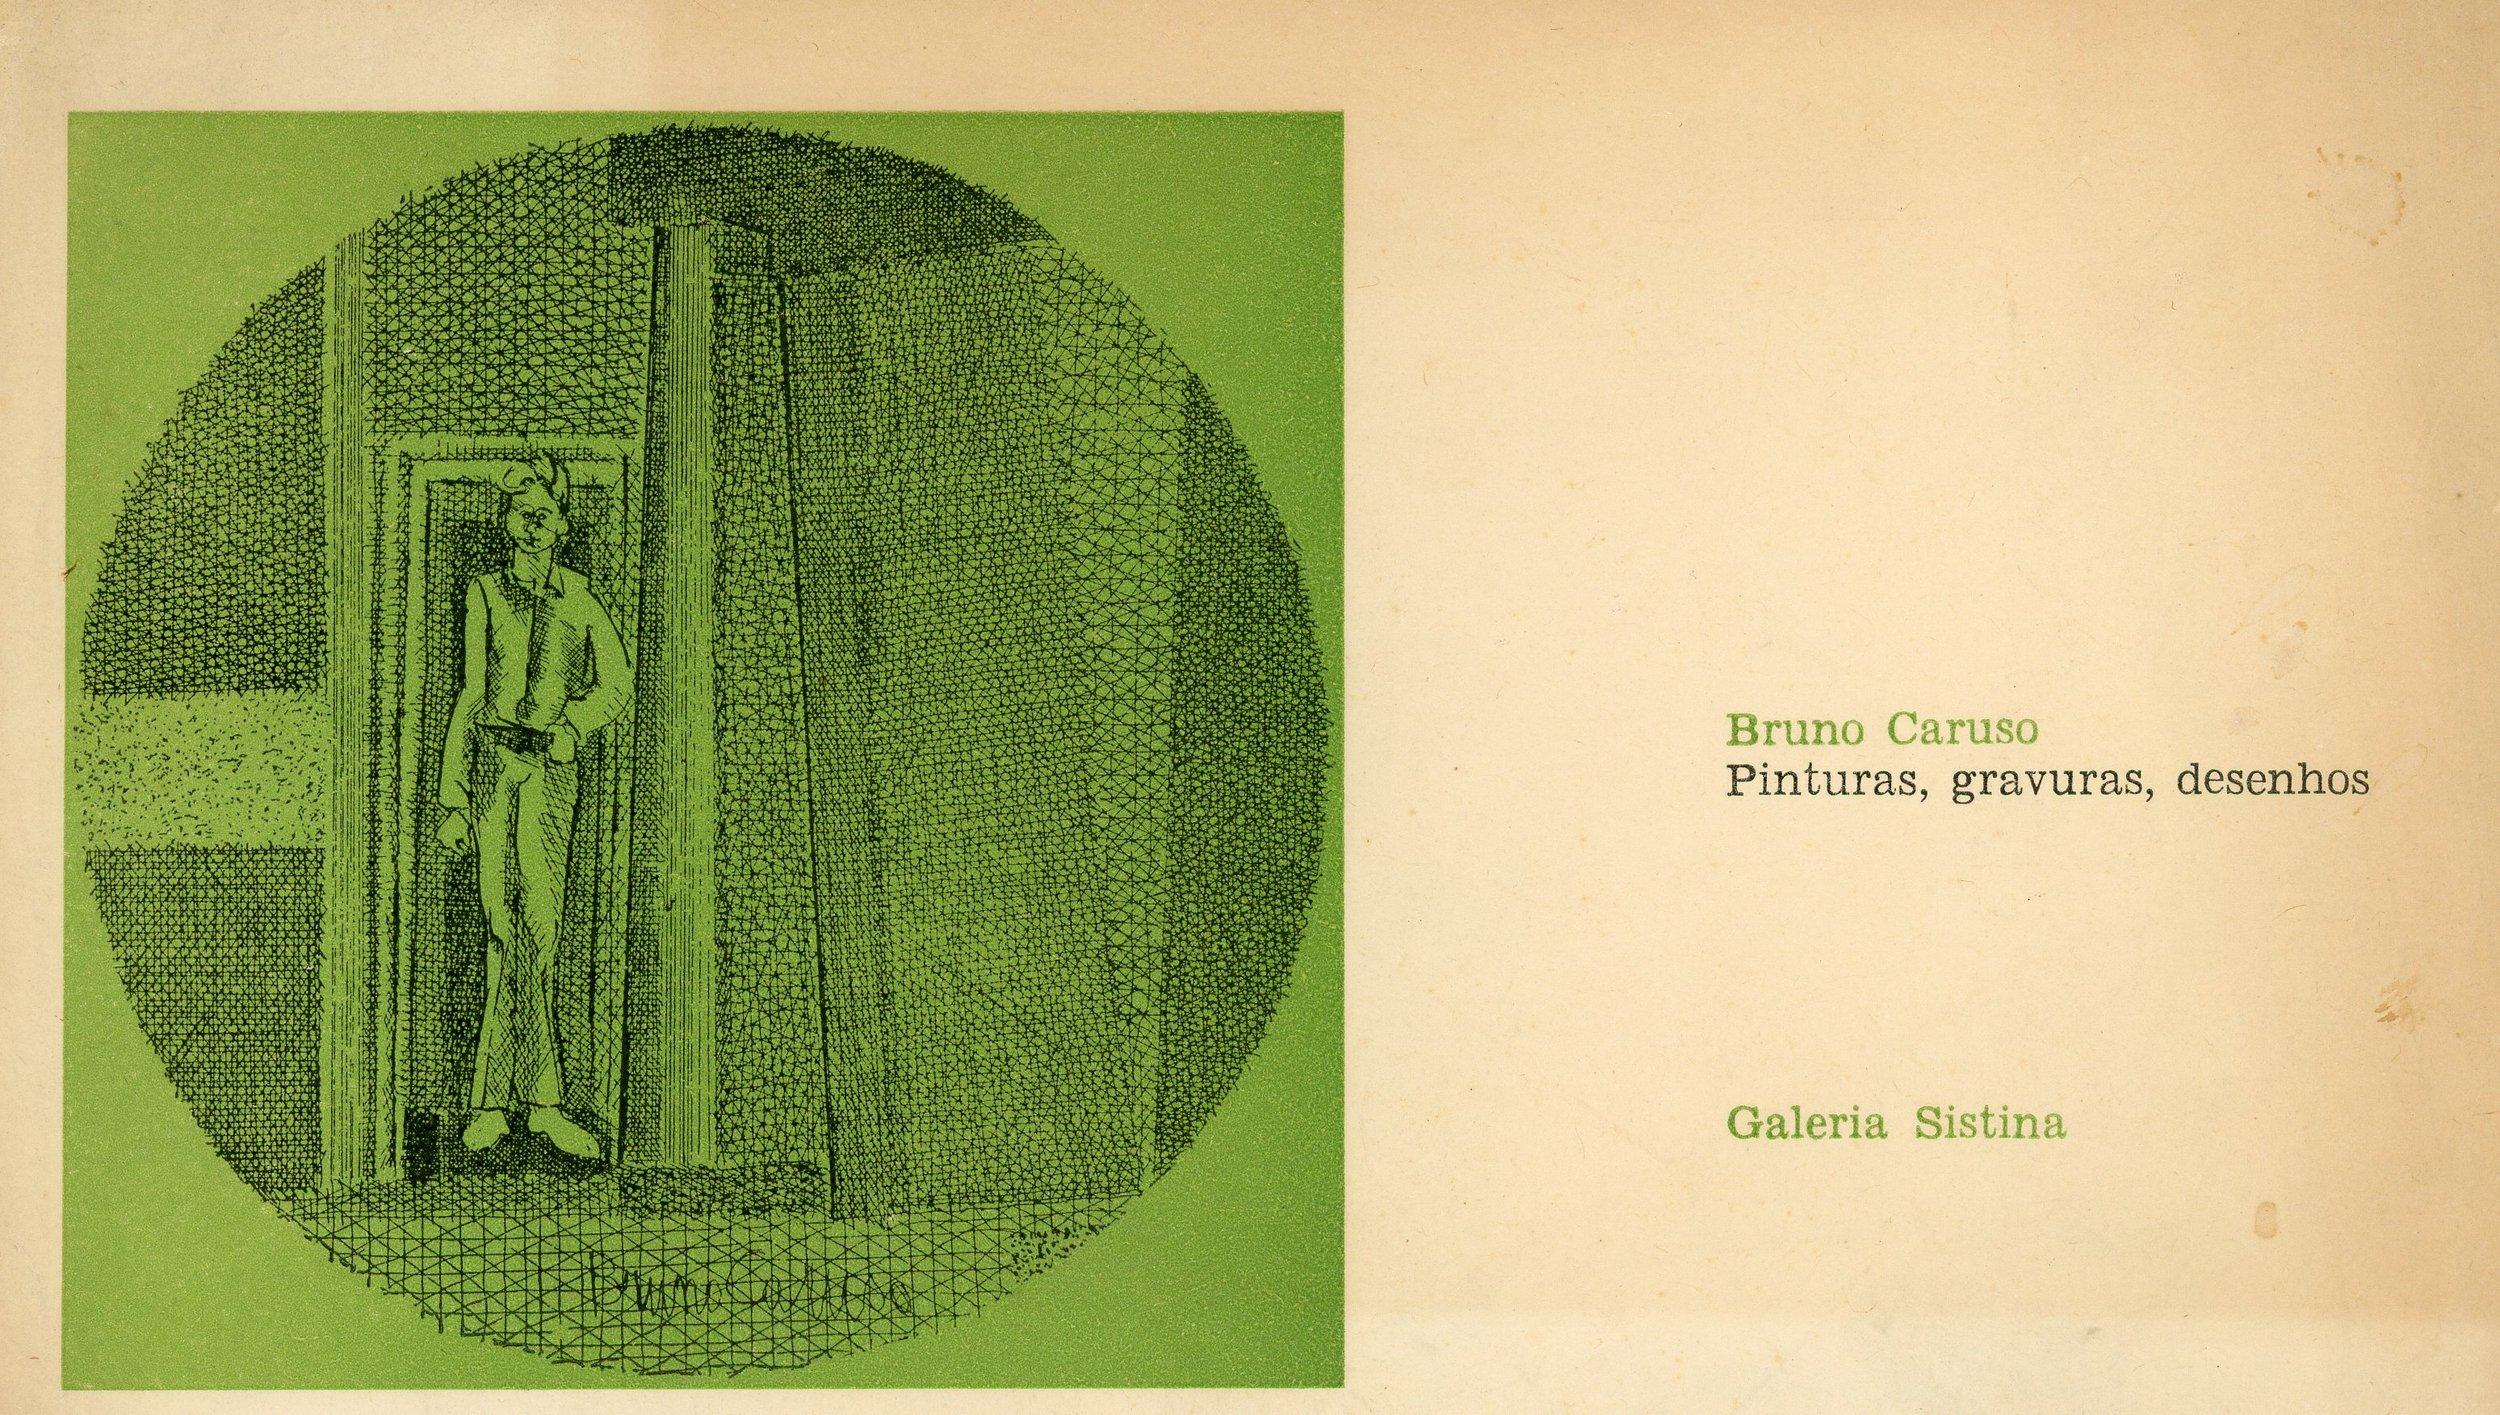 1961-01 Galeria Sistina - Bruno Caruso_01.jpg